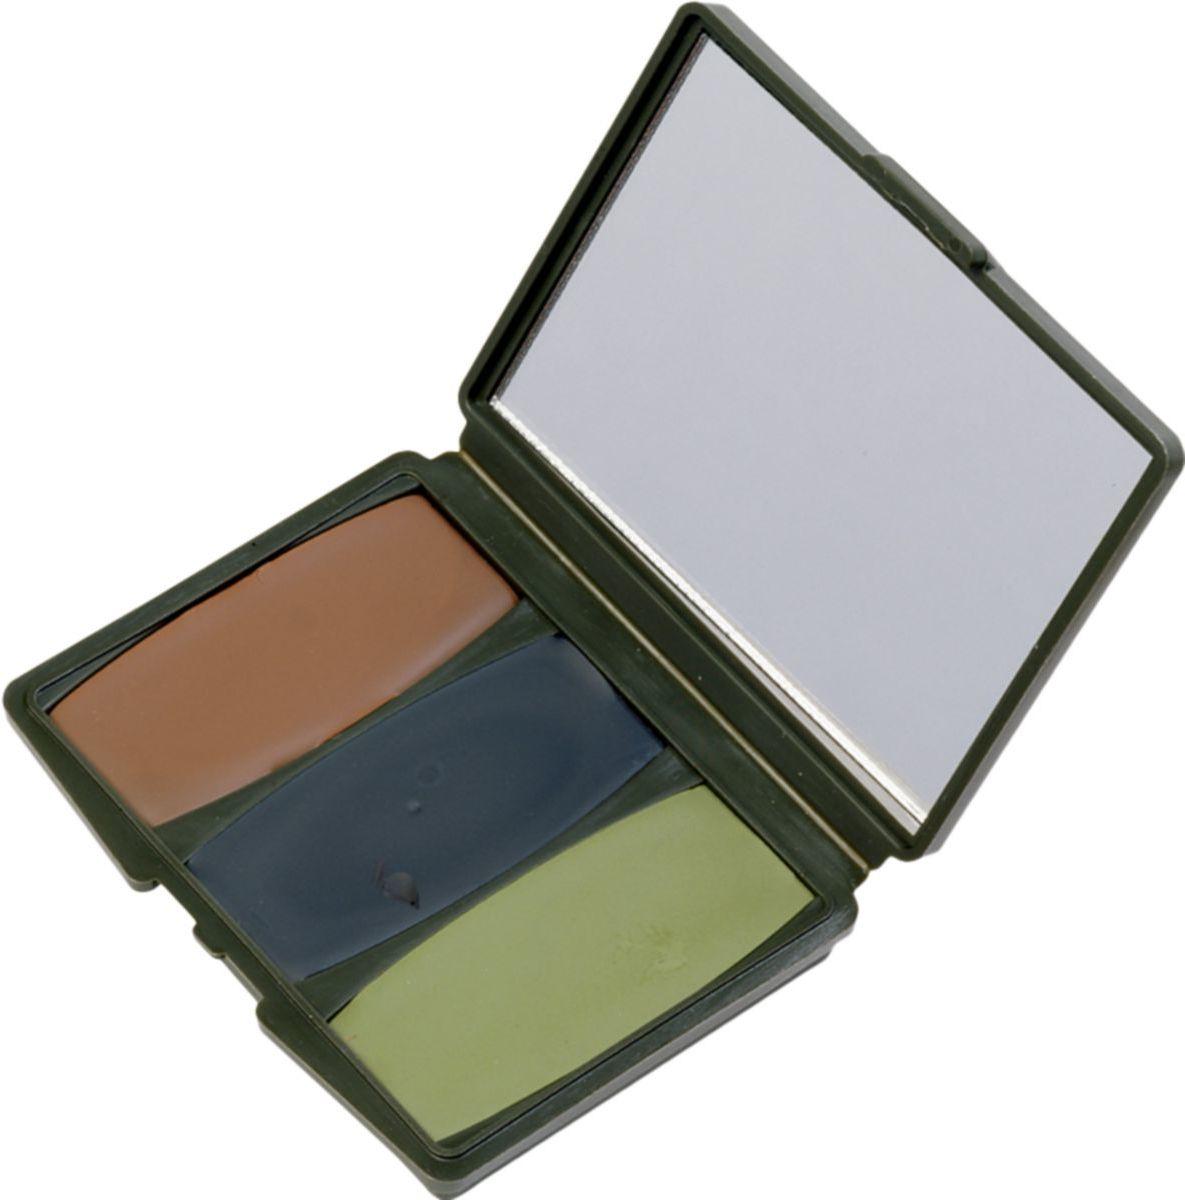 Hunters Specialties™ Three-Color Camo-Compac® Makeup Kit-Woodland